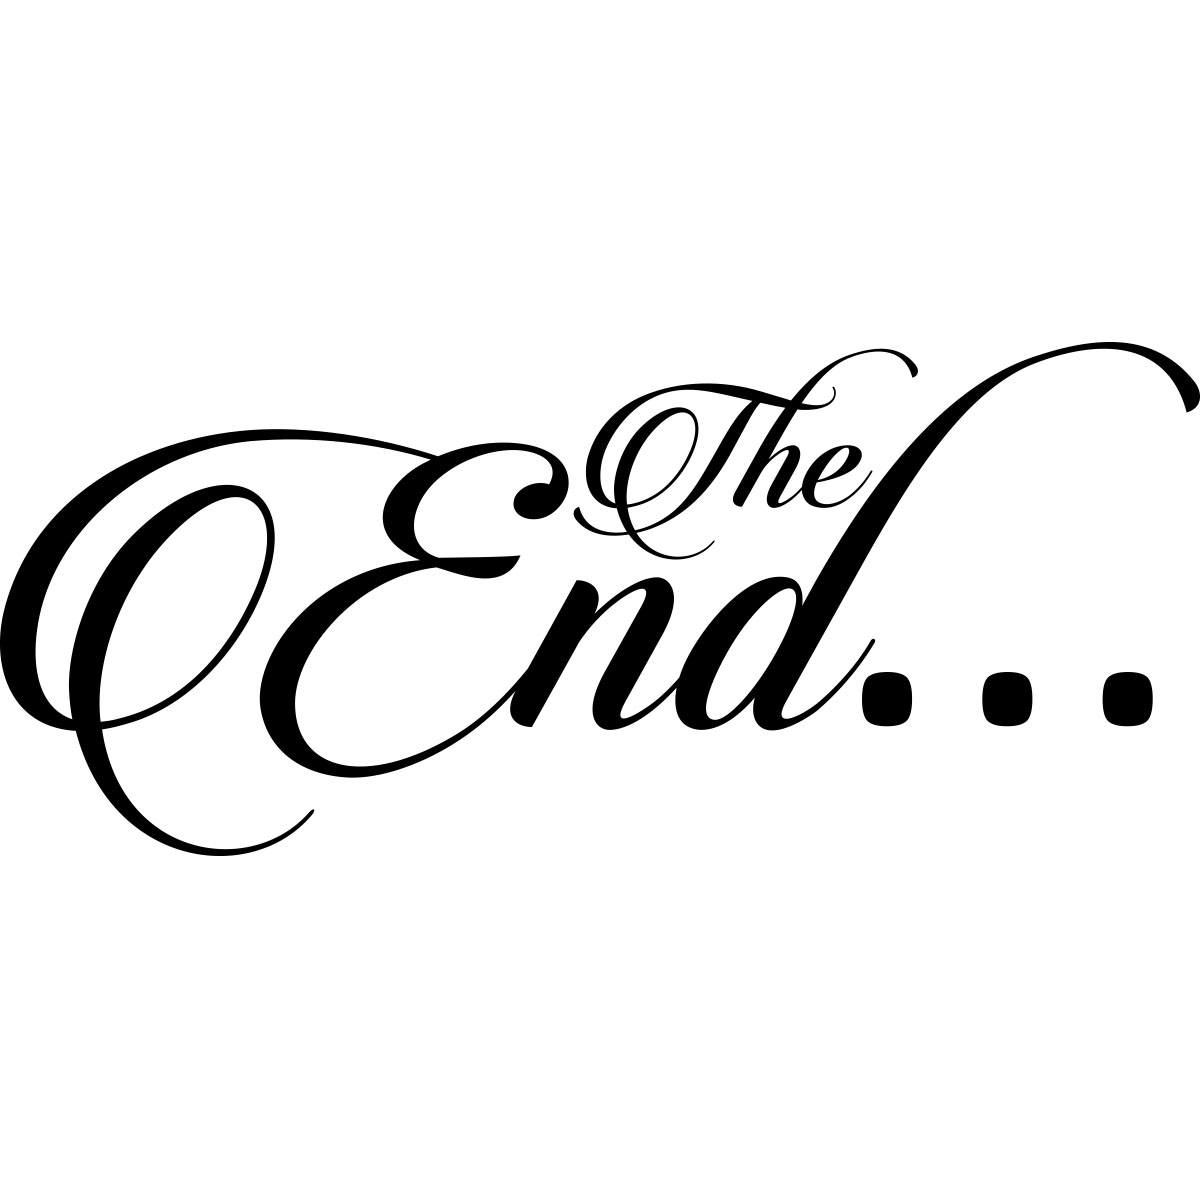 Sticker Design The End